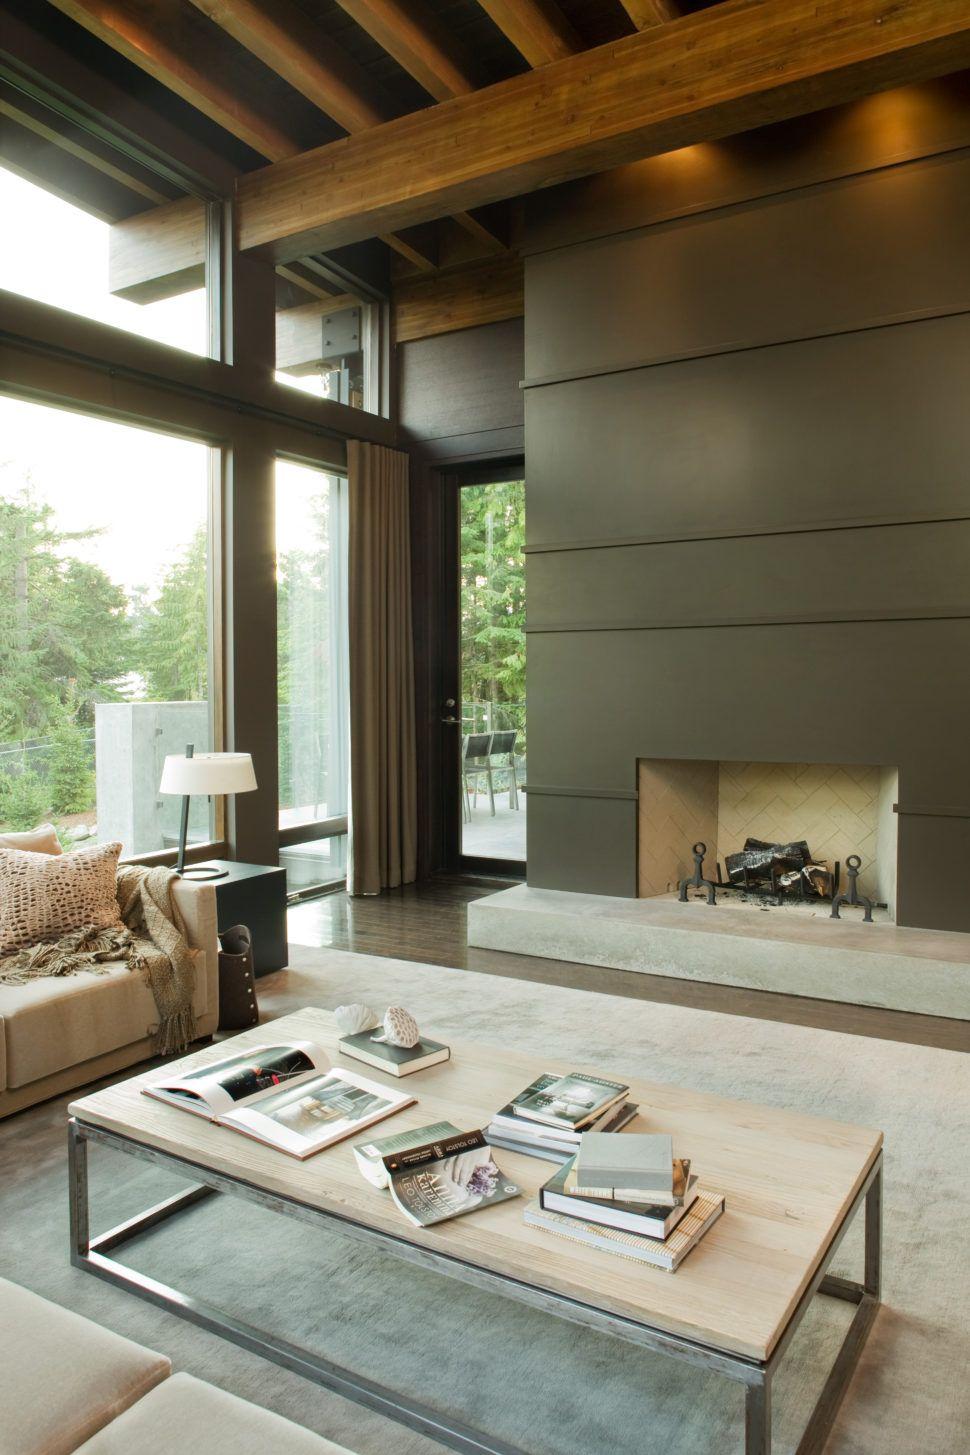 Living Room Interior Design Pdf: COMPASS POINT VILLA, WHISTLER